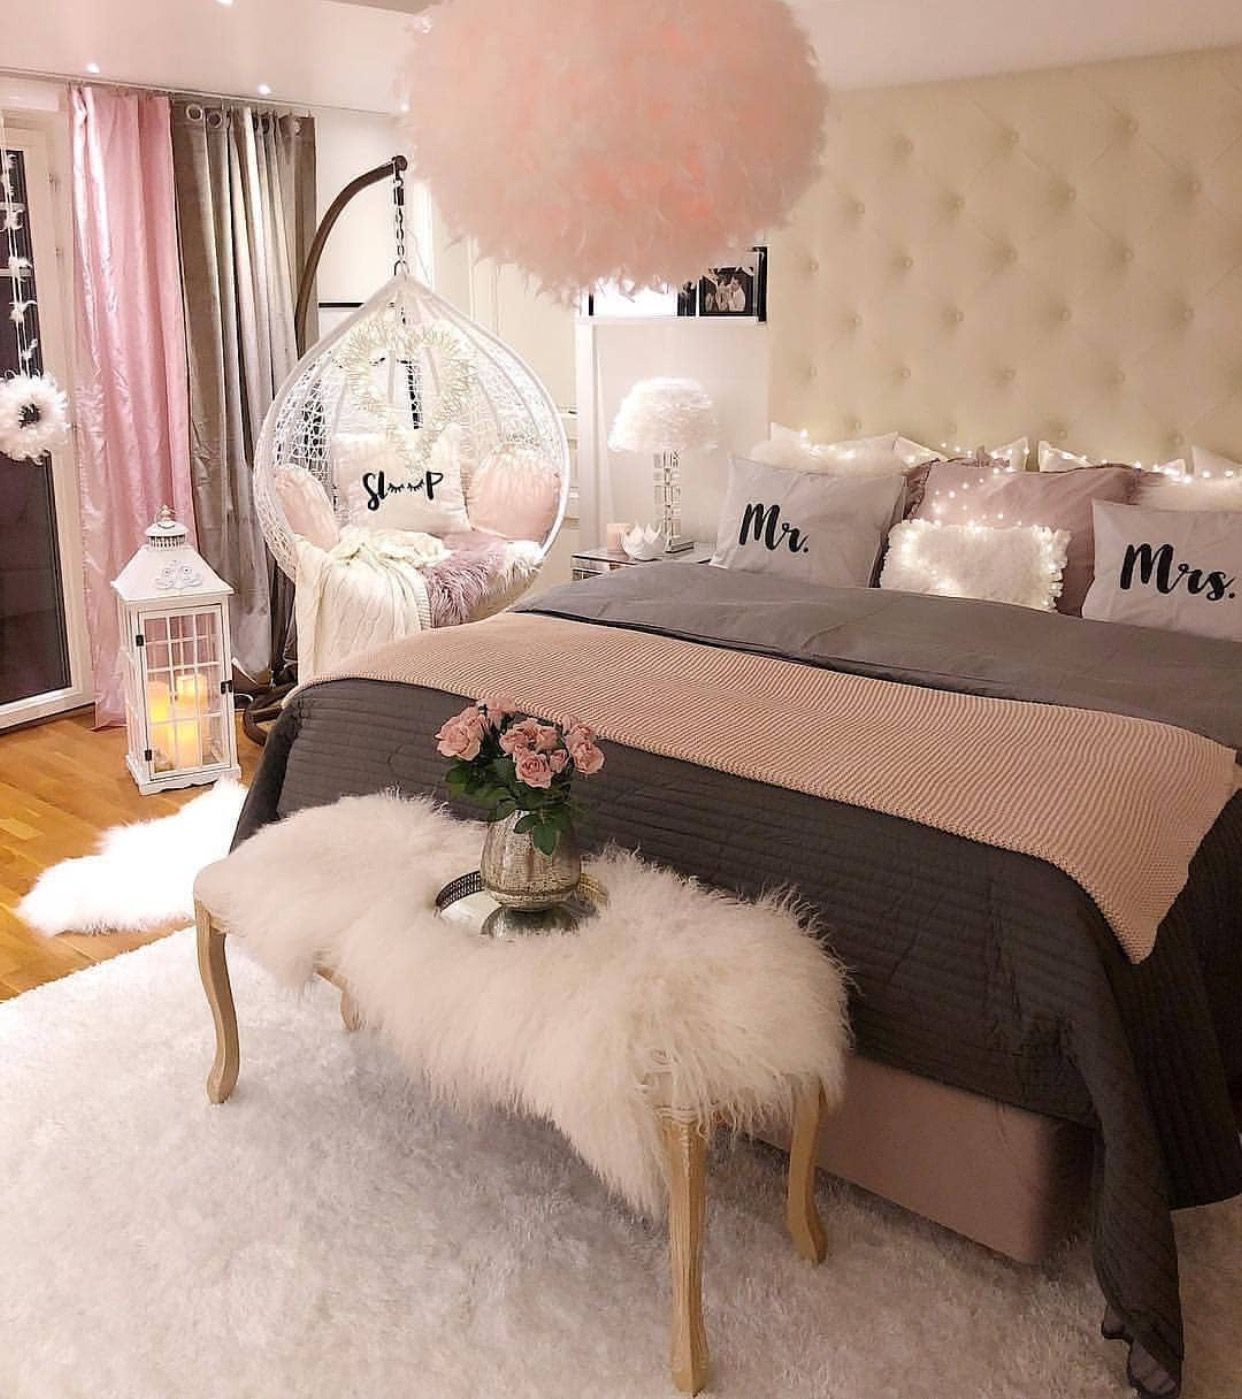 Bedroom Ideas ديكور وتصاميم غرف نوم بنات Bedroomideas Apartmentdecor Bedroomdesign Bedroomdecor Pinkbed Home Decor Bedroom Pink Bedroom Decor Home Decor